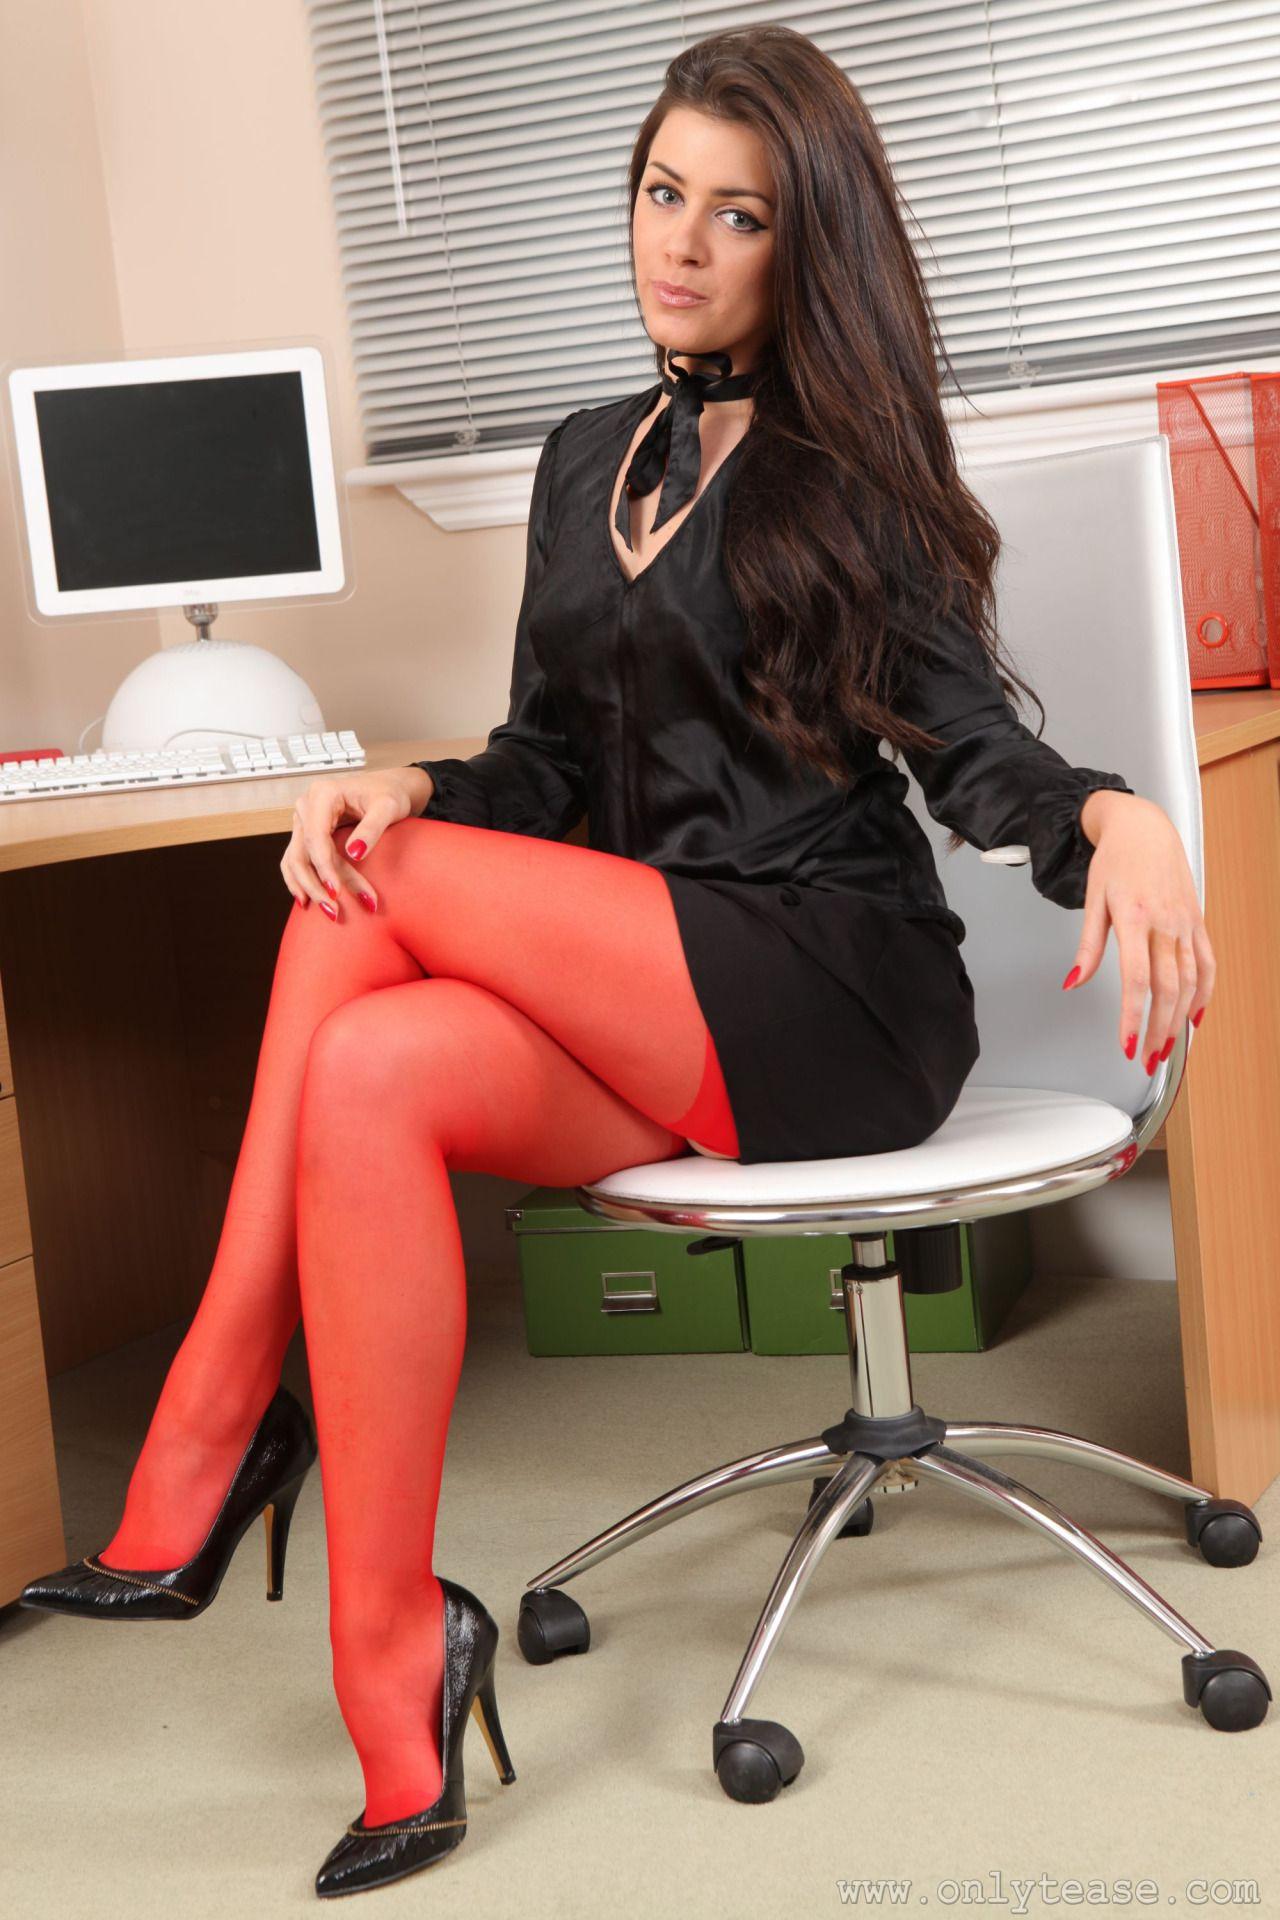 legs and hose : photo | fotos de modelos | pinterest | legs